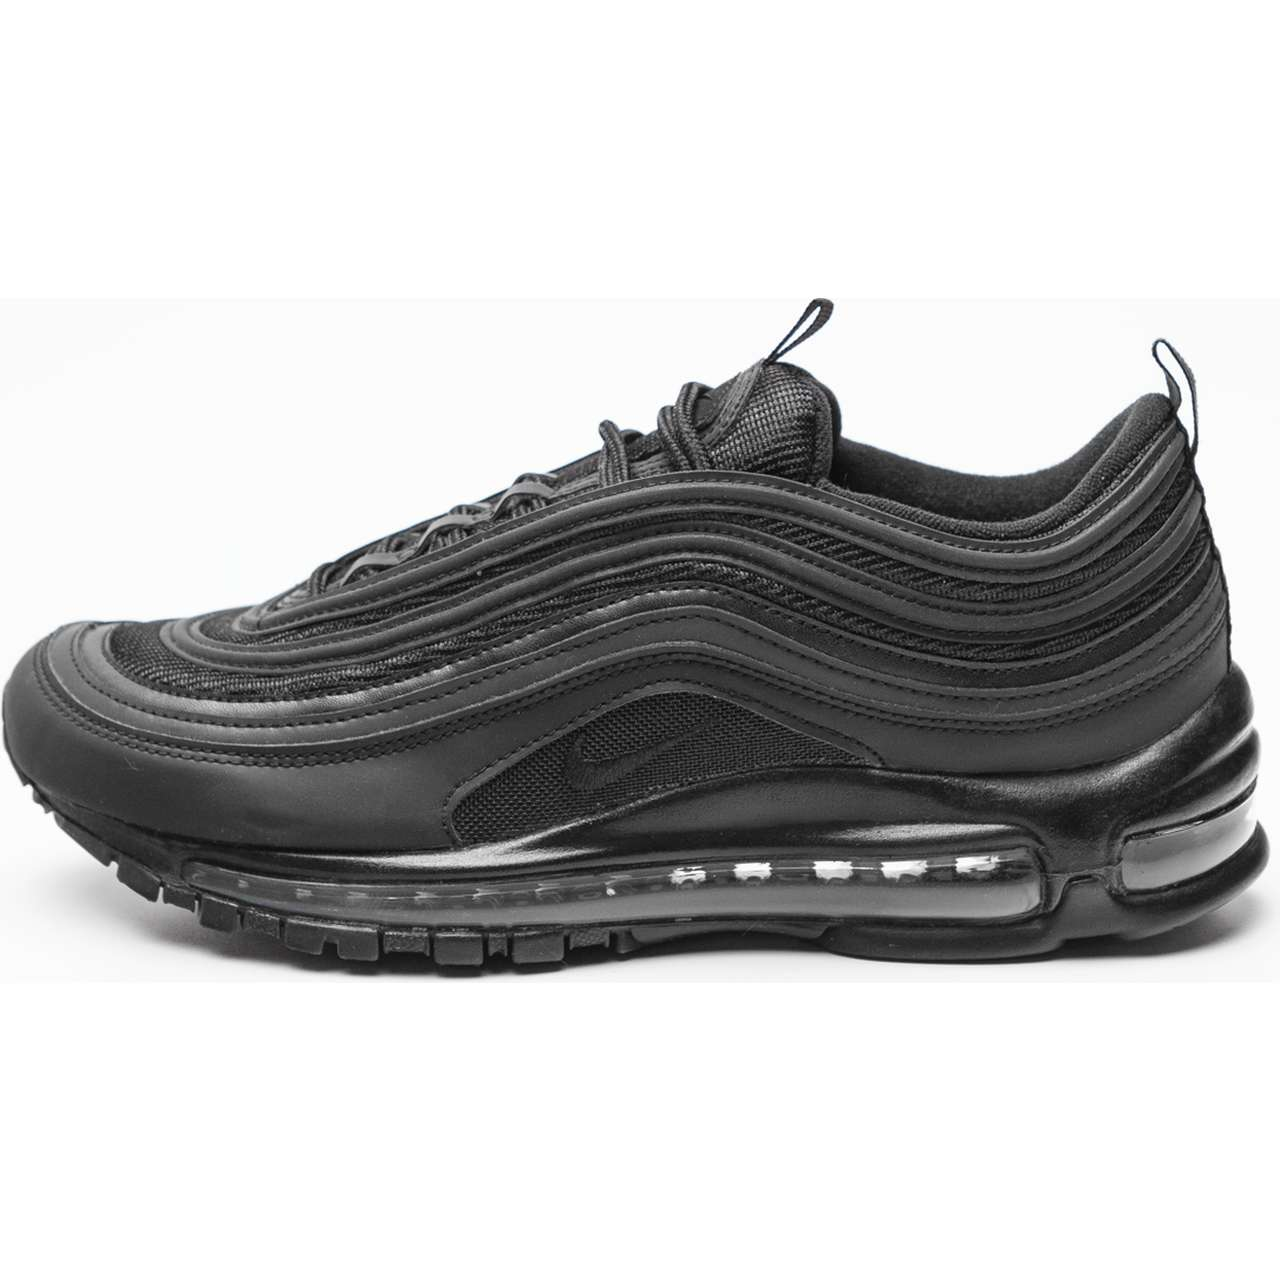 Buty Nike AIR MAX 97 001 BLACK eastend.pl